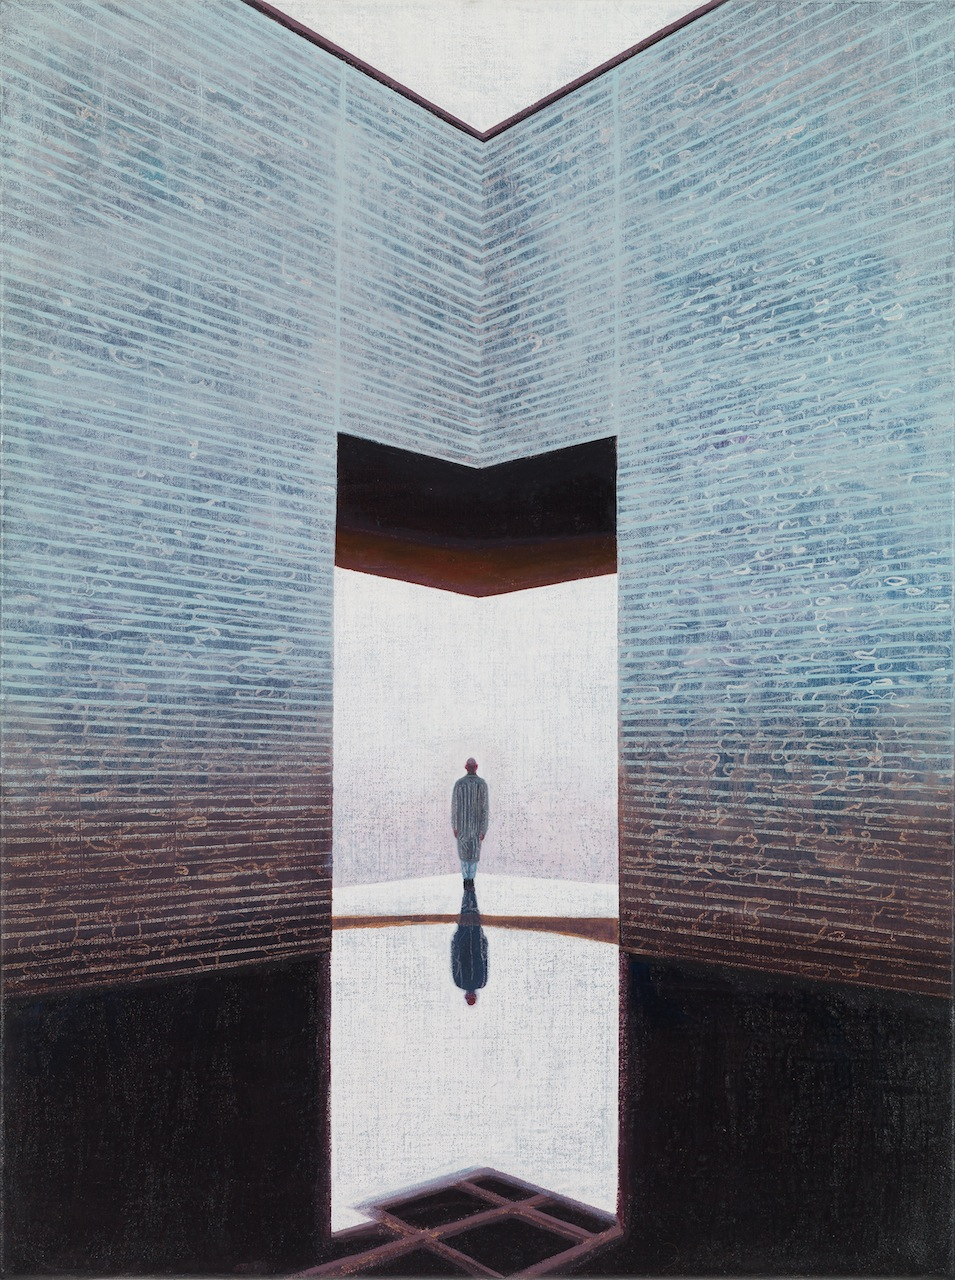 Hans Vandekerckhove / Into the Night / Litho on 310 g paper / 1 out of 8 / 75 x 60 cm framed